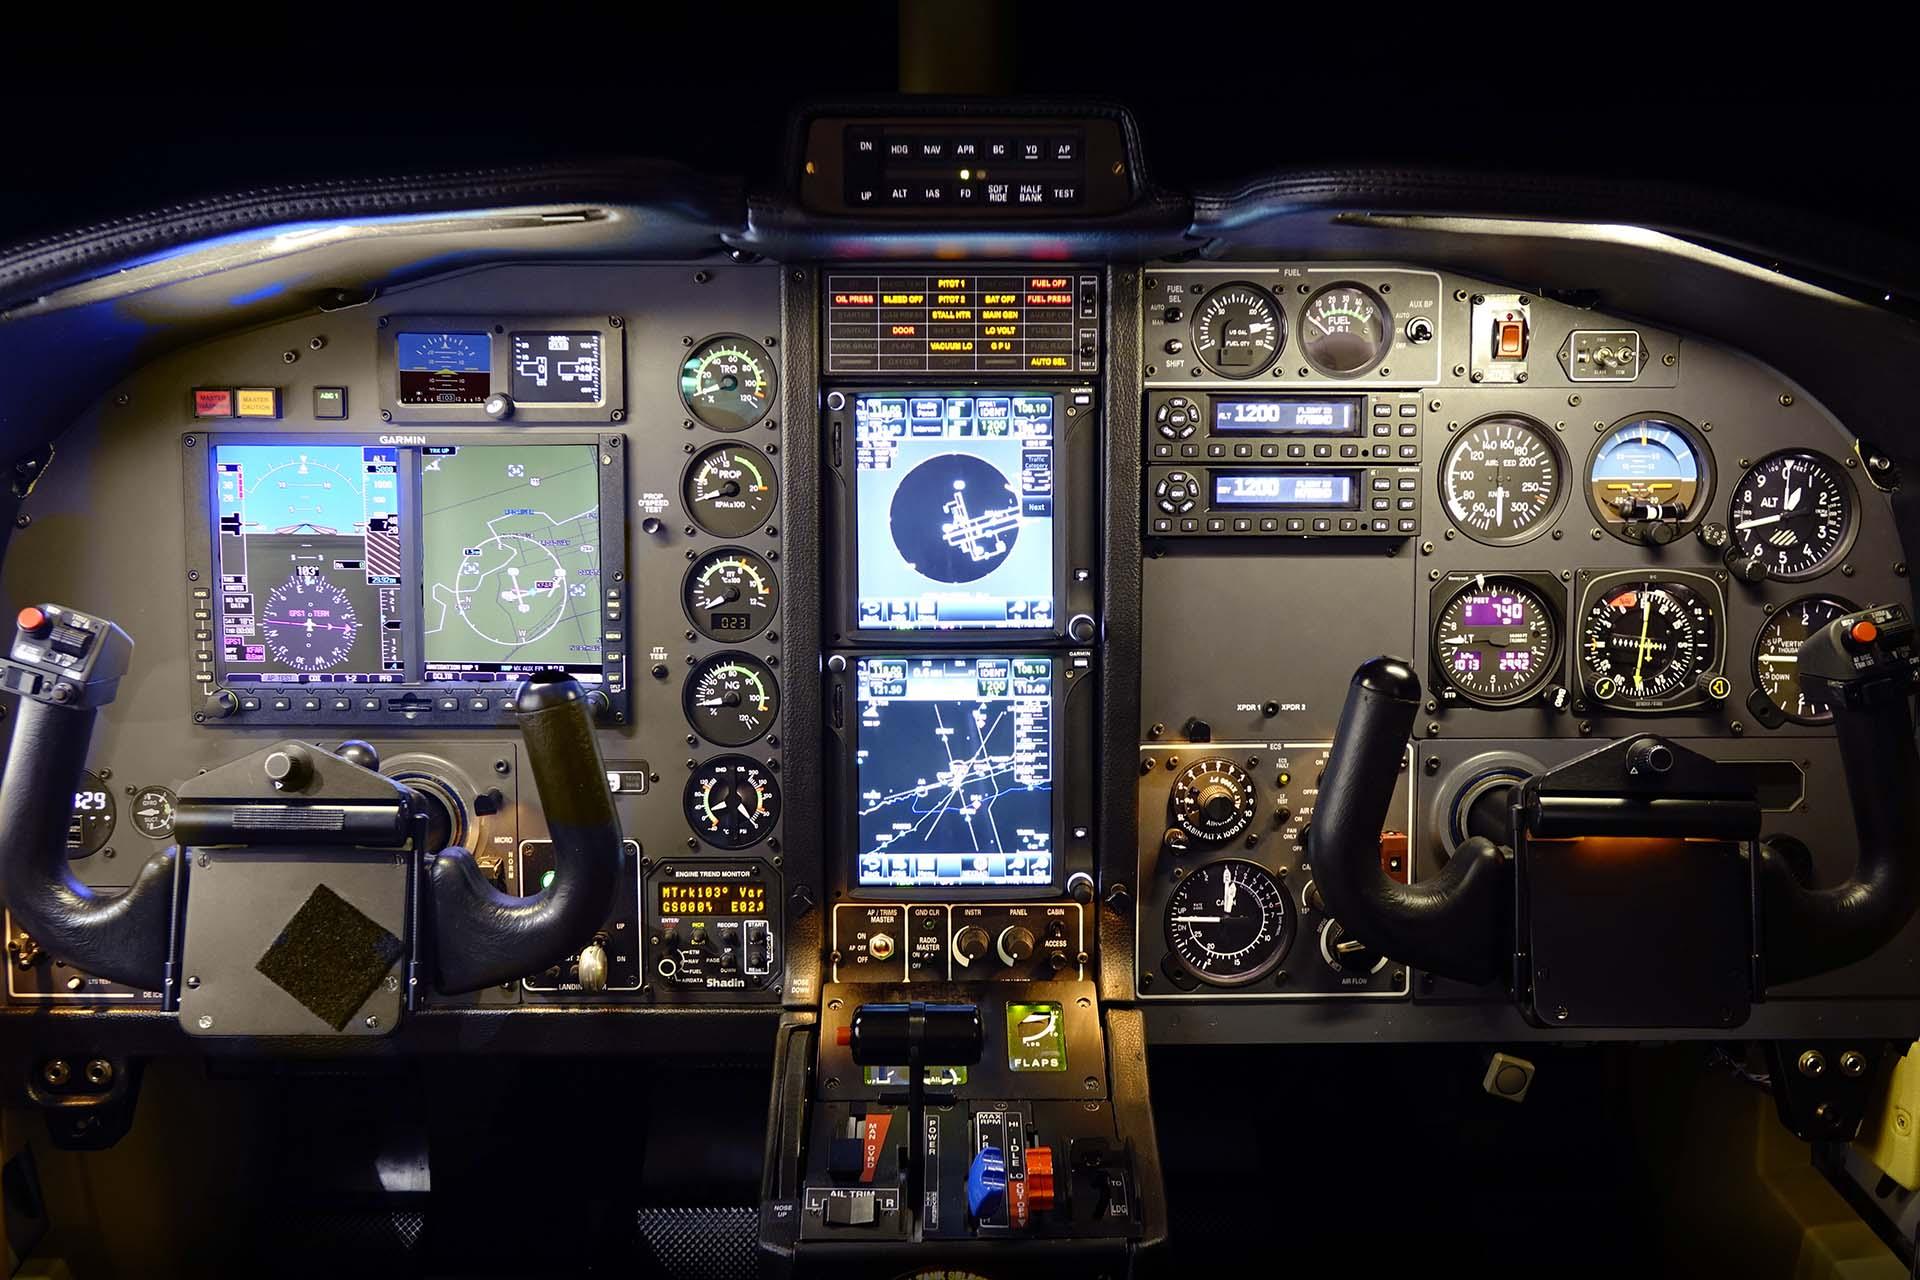 TBM 700 Cockpit Avionics Upgrades Fargo Jet Center